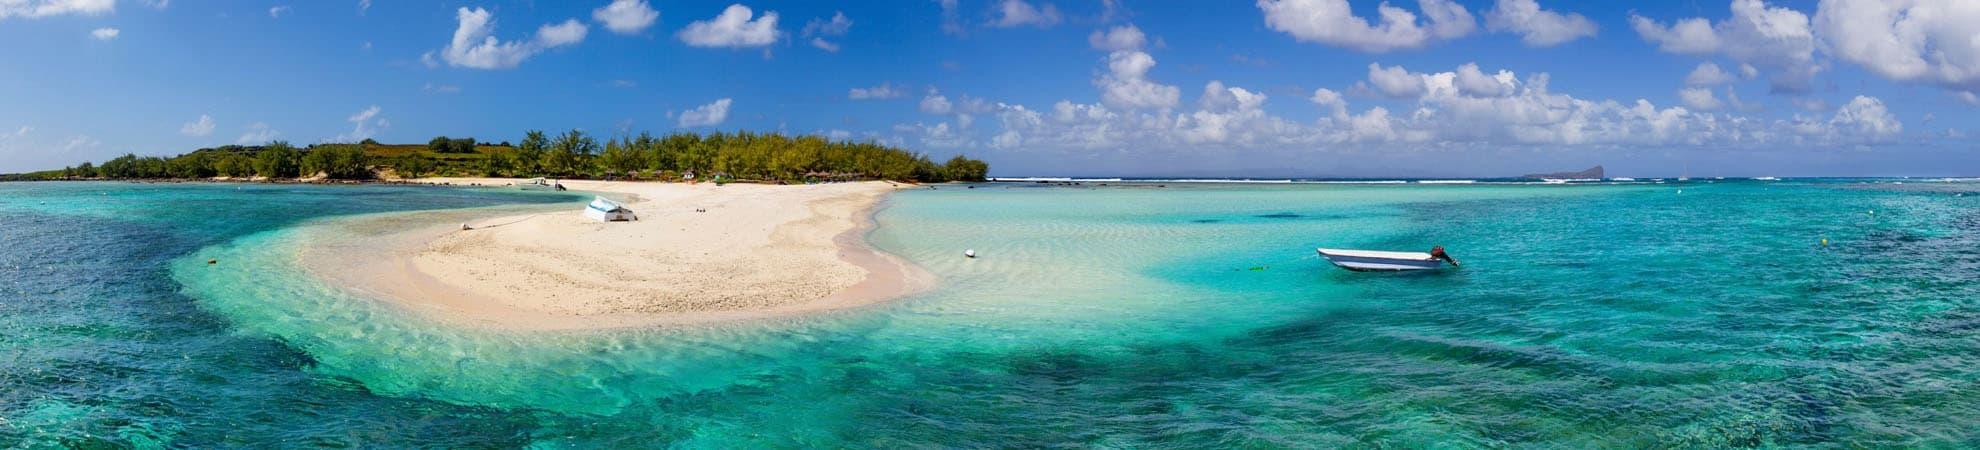 Visiter l'Île Maurice